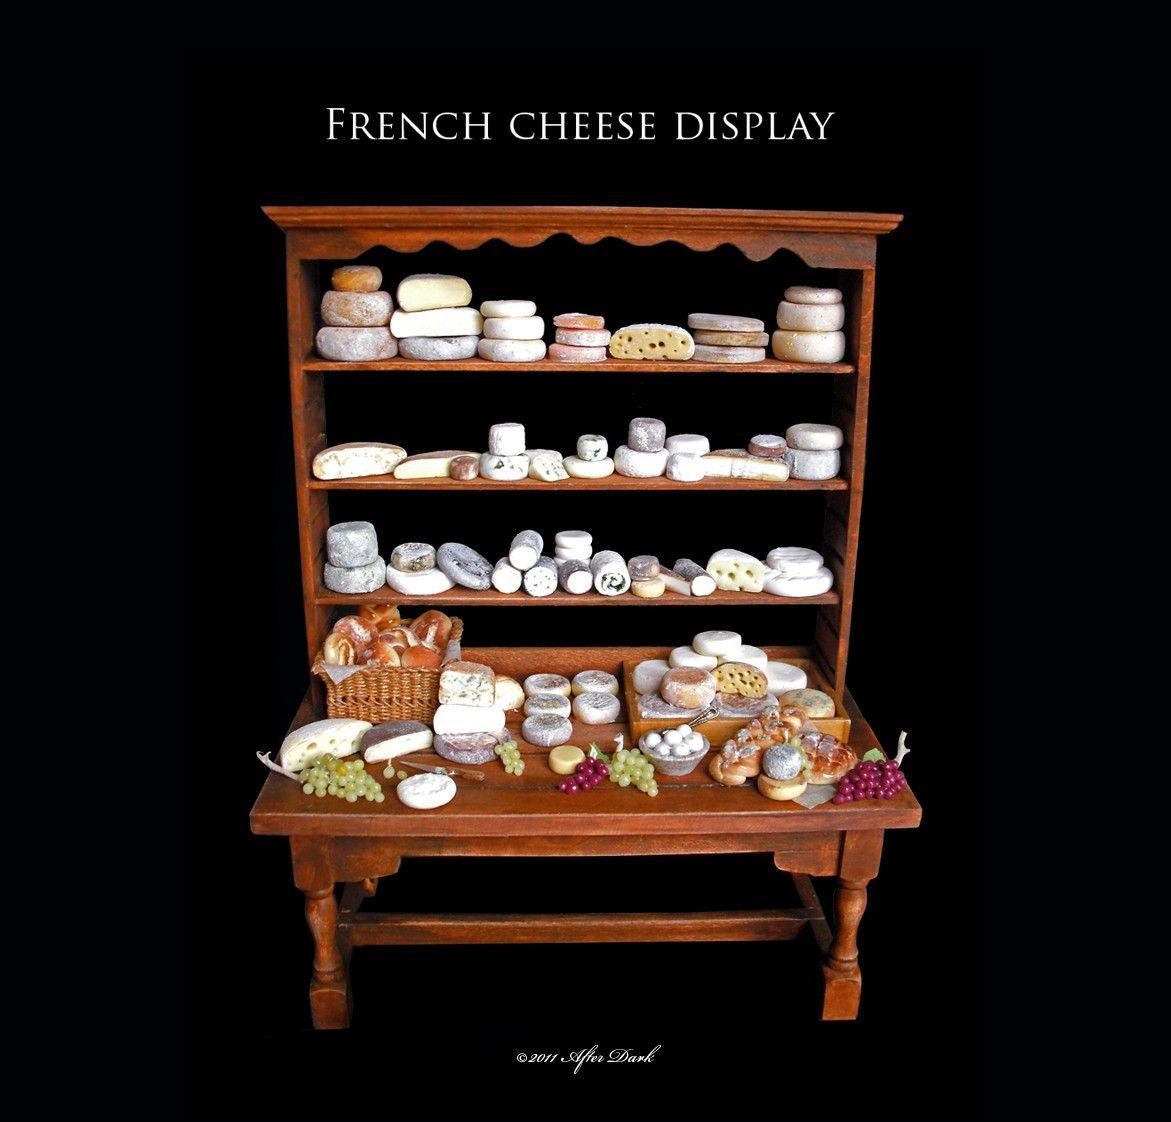 French luxury cheese display artisan fully handmade miniature in